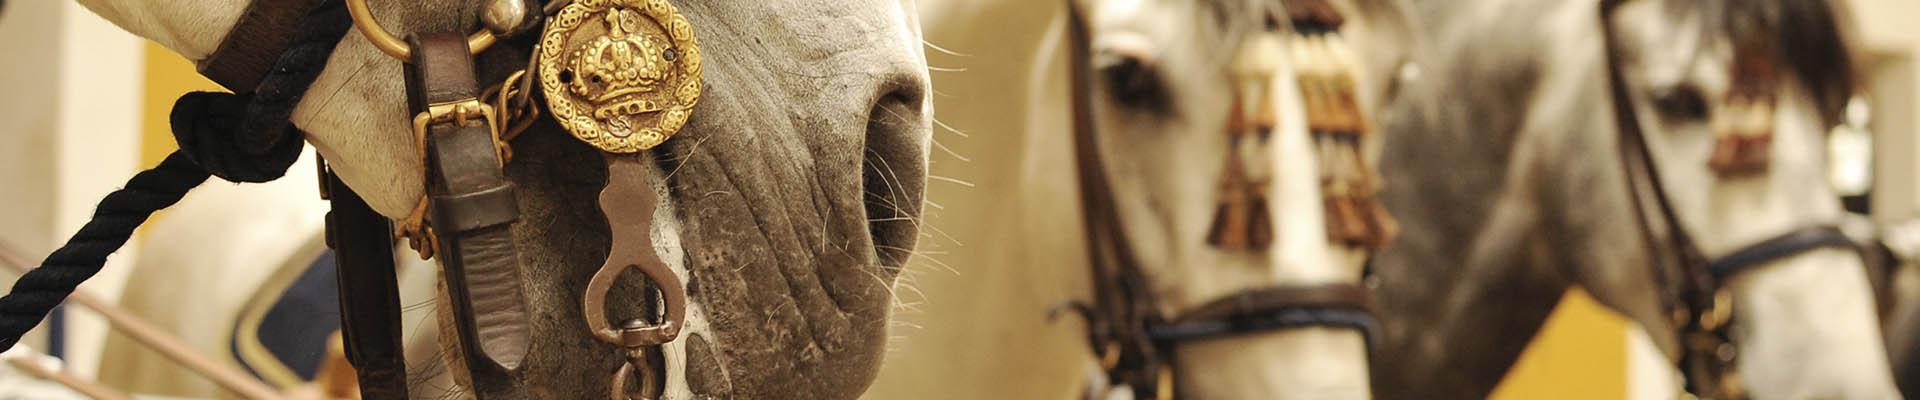 Cabecera caballo licitaciones